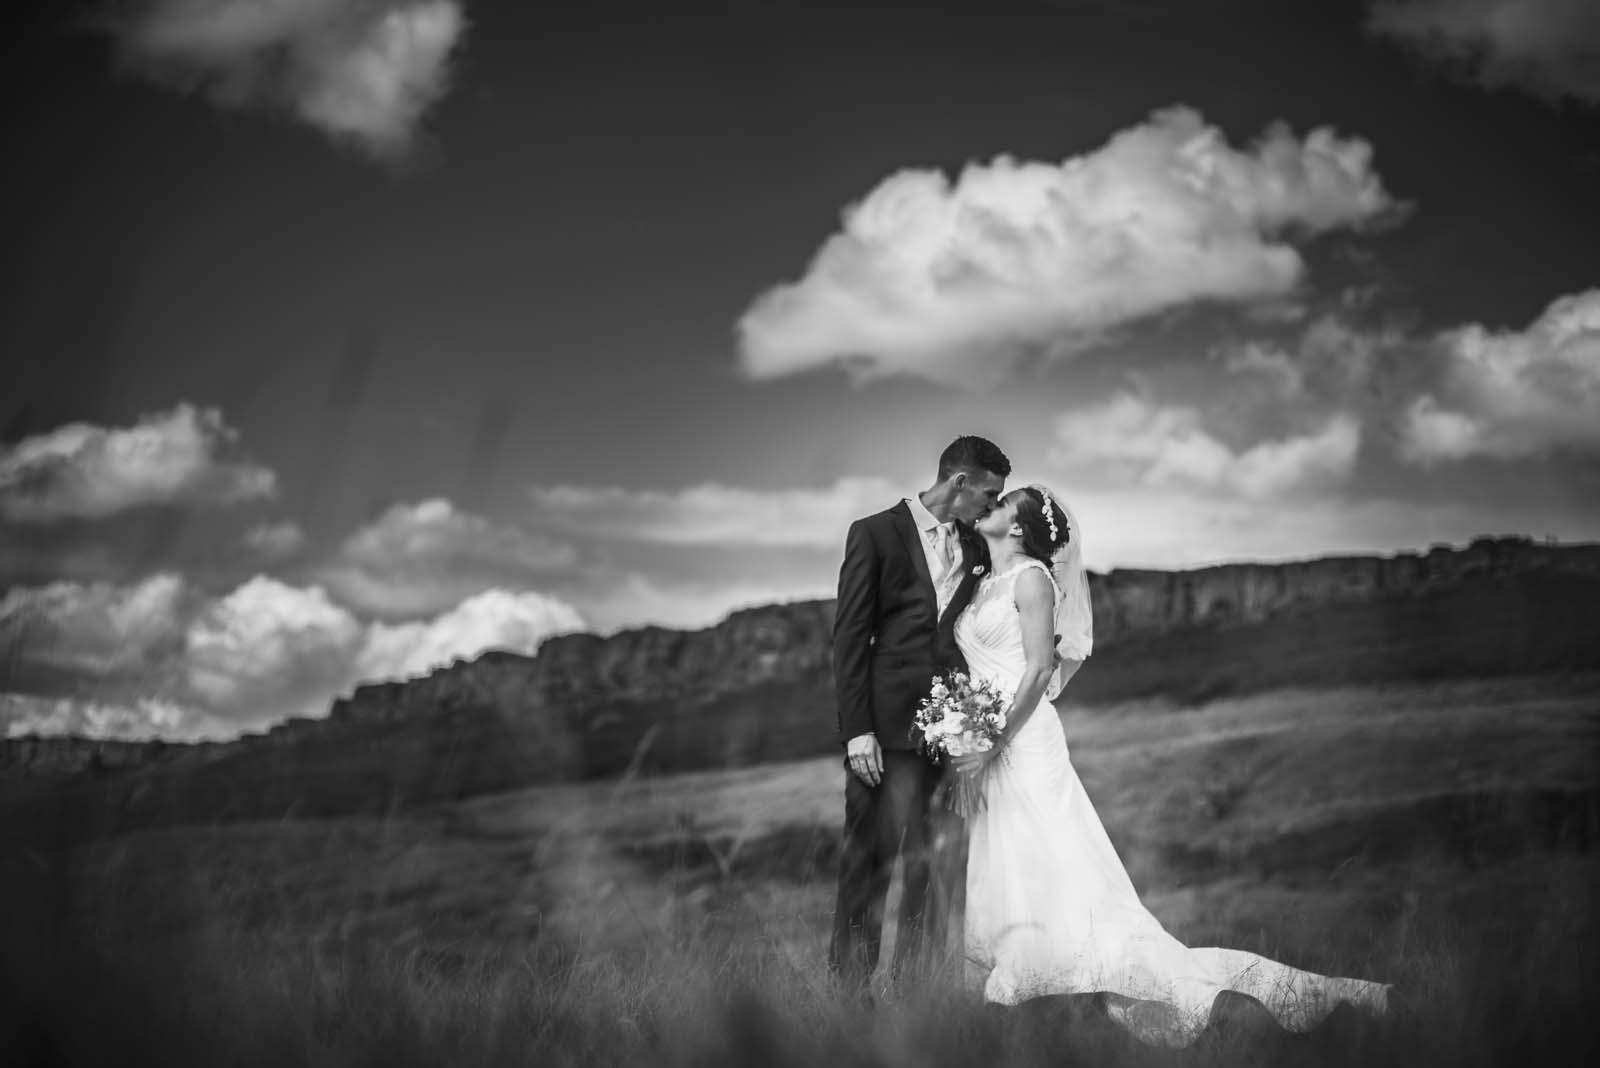 Jennifer & David by London Wedding Photographer Matthew Williams-Ellis 163